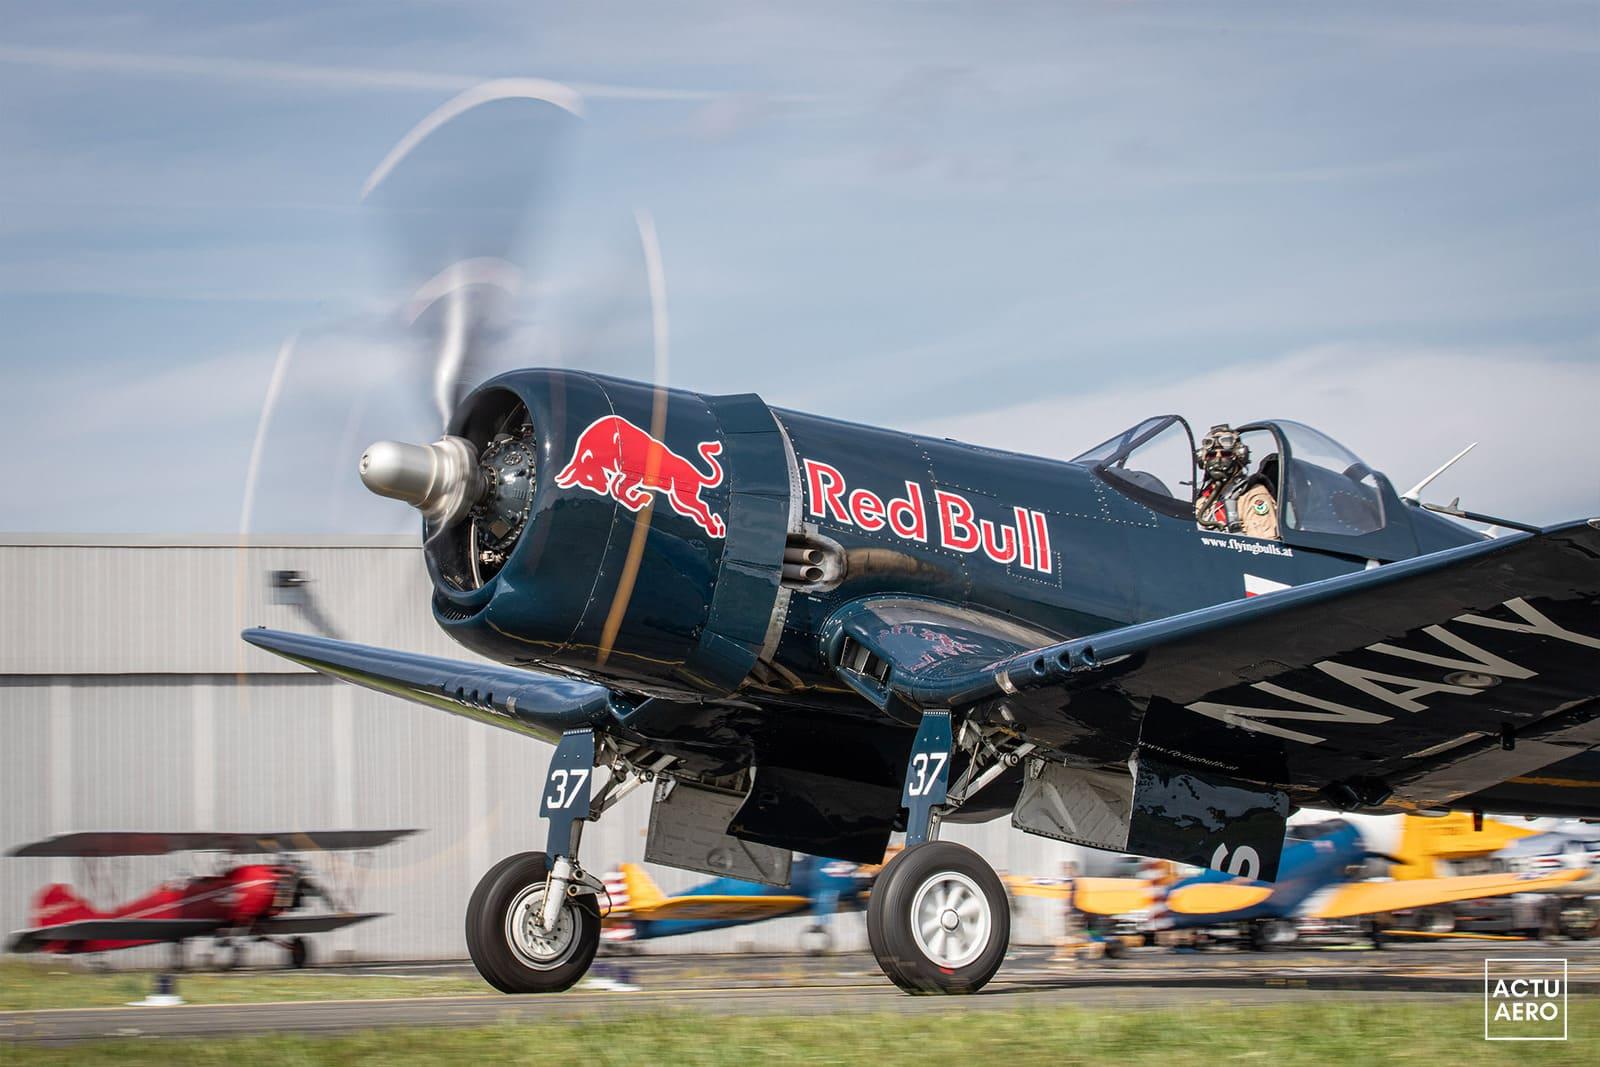 Corsair Red Bull